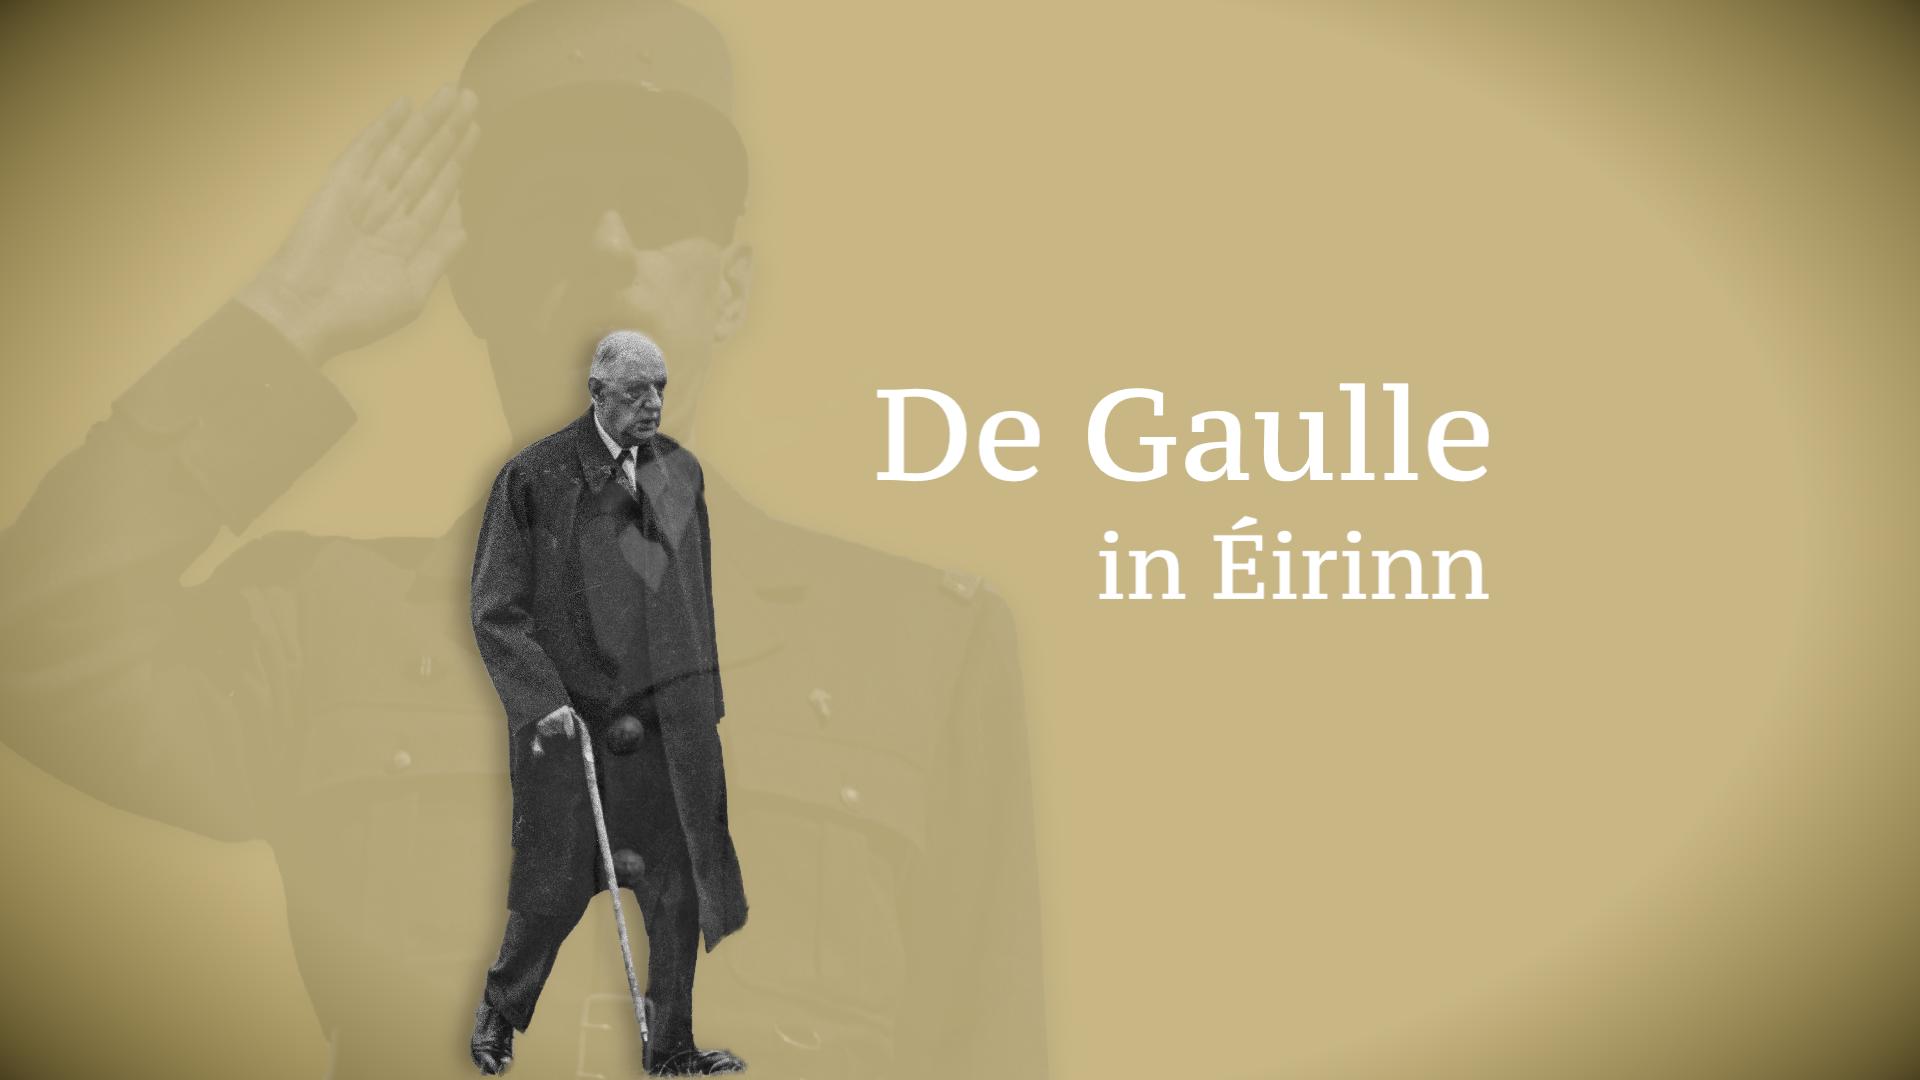 De Gaulle in Éirinn (De Gaulle in Ireland)